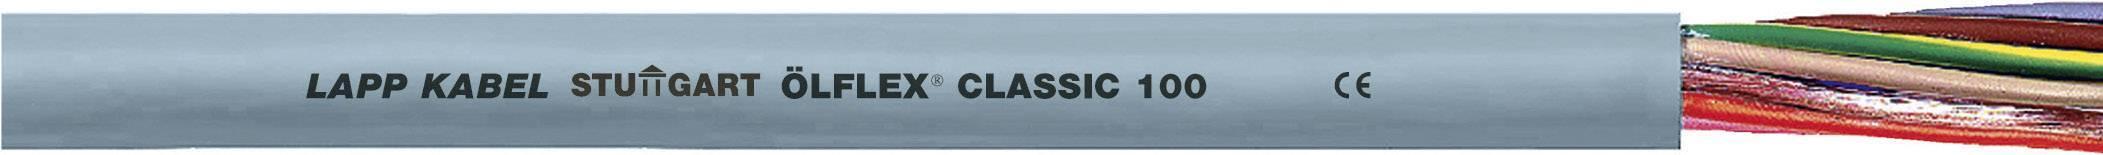 Kabel LappKabel Ölflex CLASSIC 100 14G0,5 (0010009), PVC, 9,5 mm, 500 V, šedá, 100 m